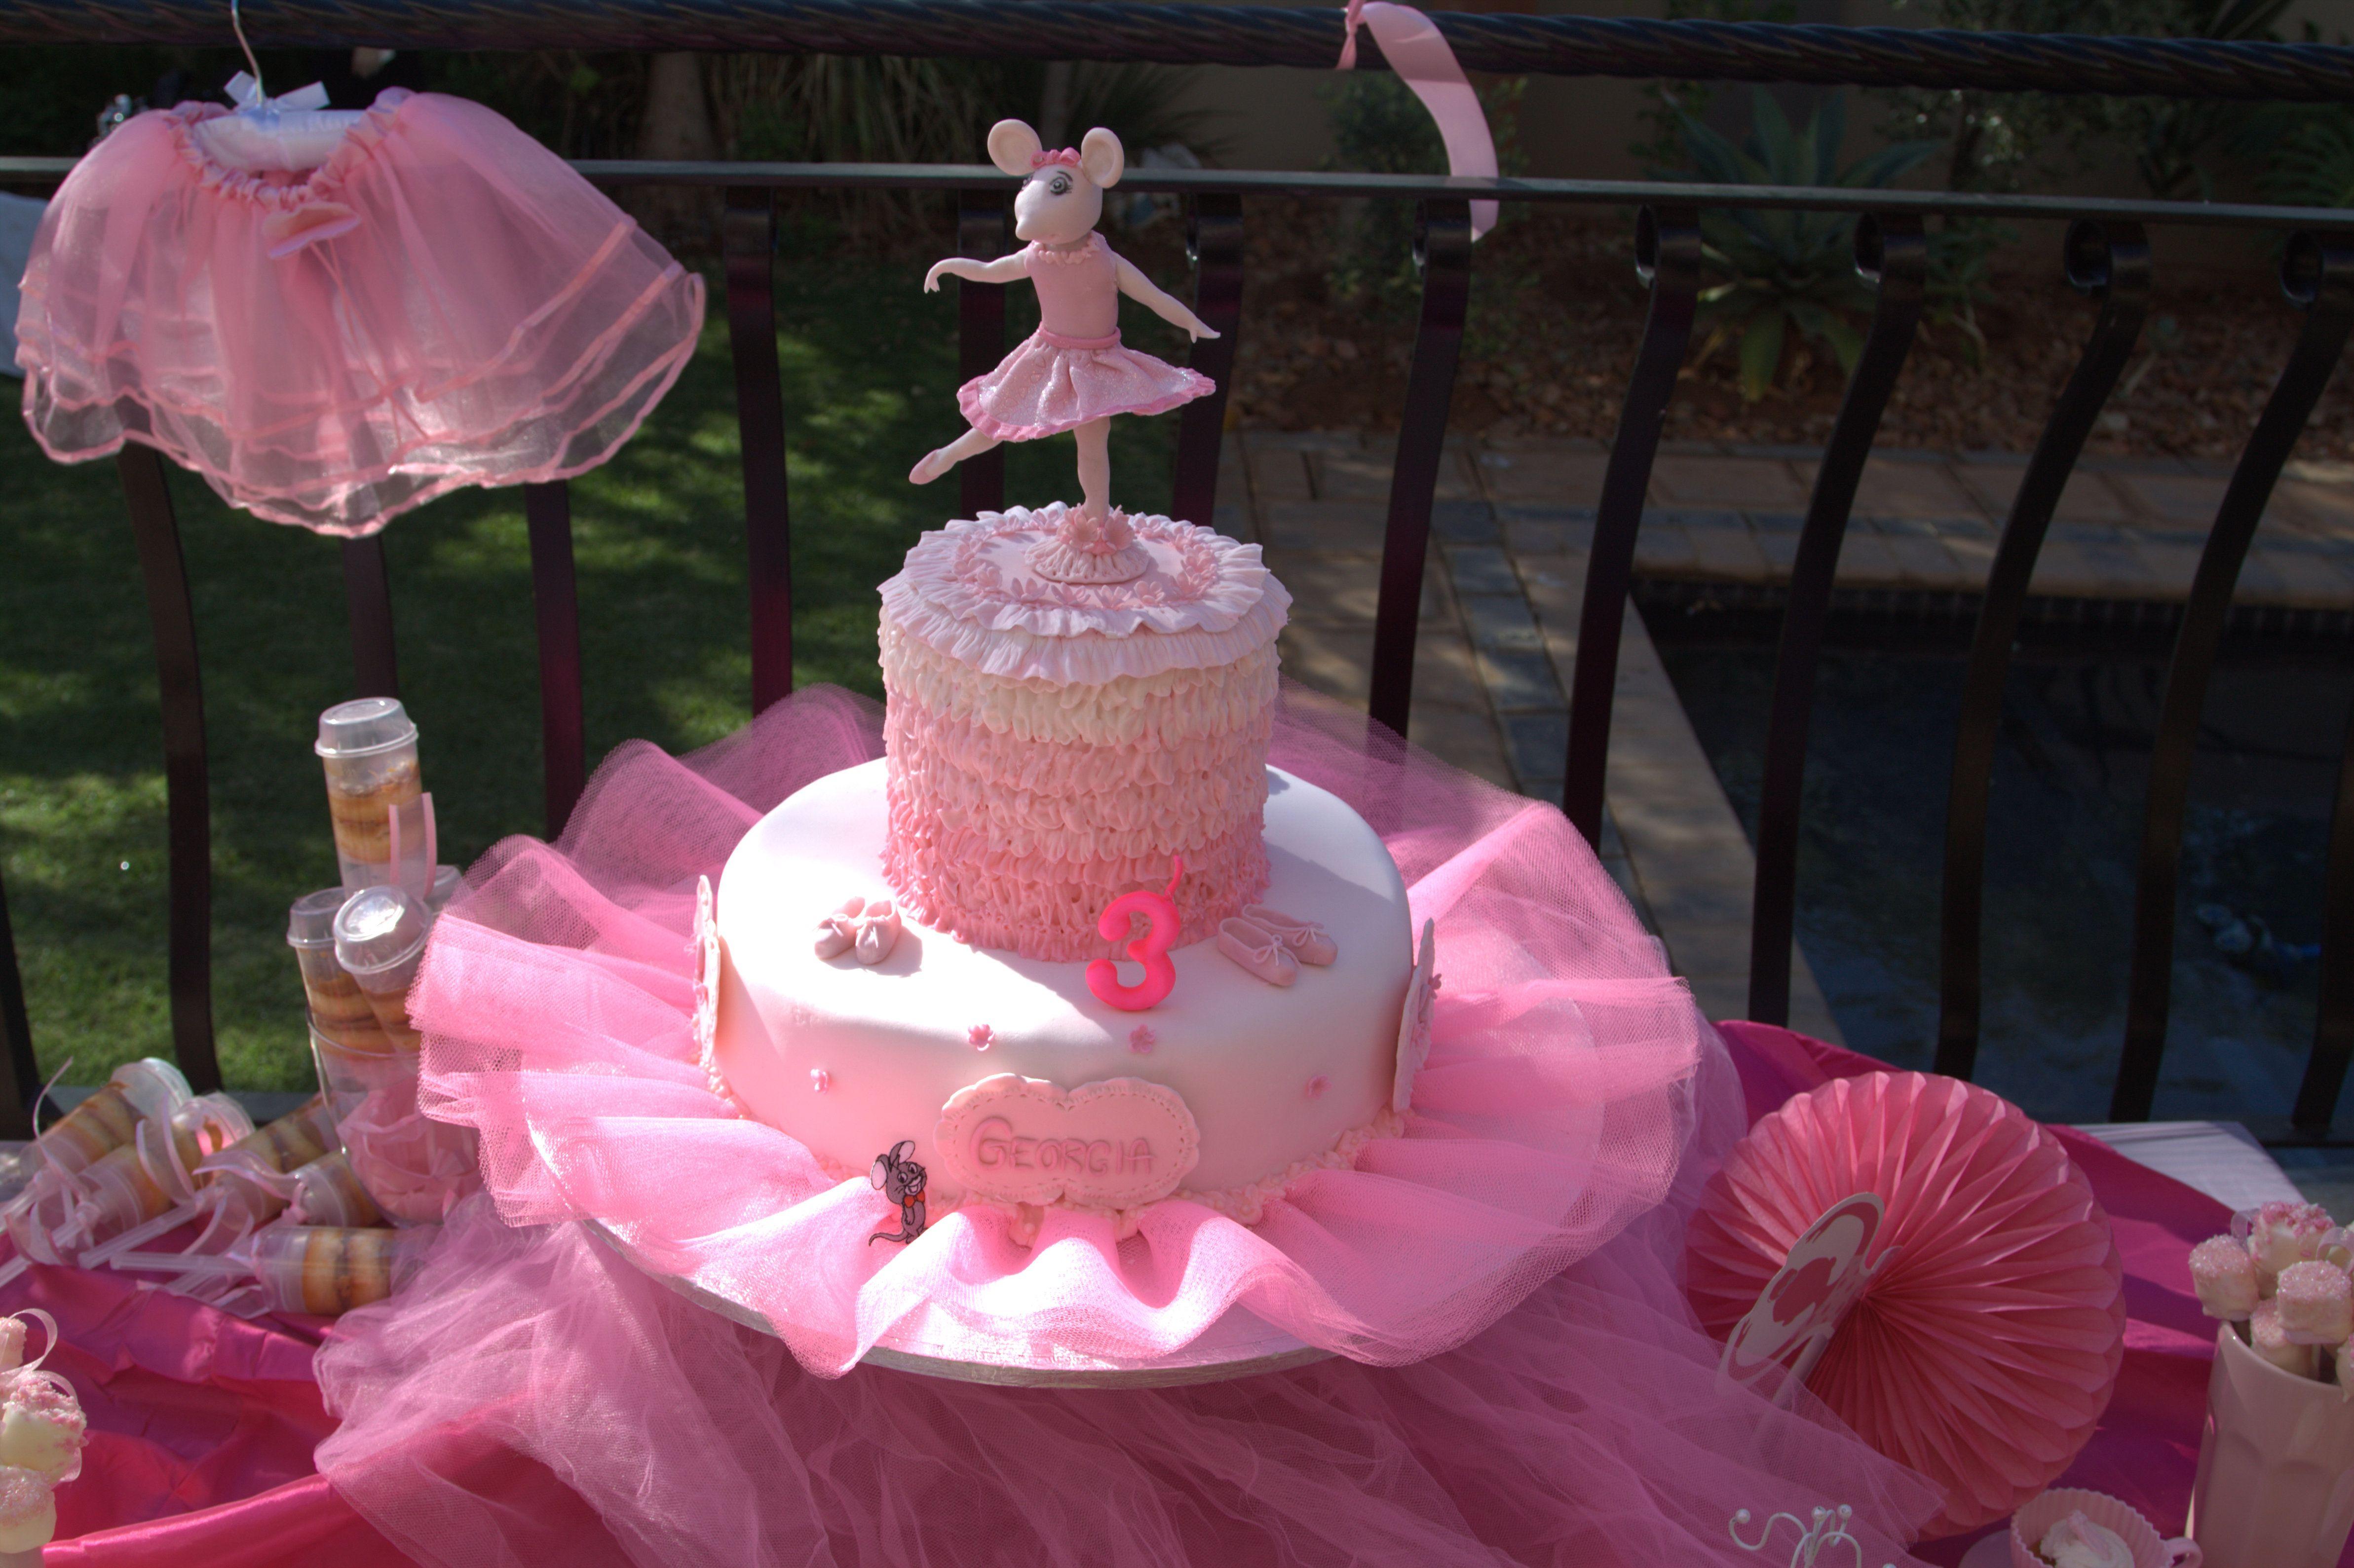 Angelina Ballerina birthday cake  Leahs first birthday ideas!(:  P ...